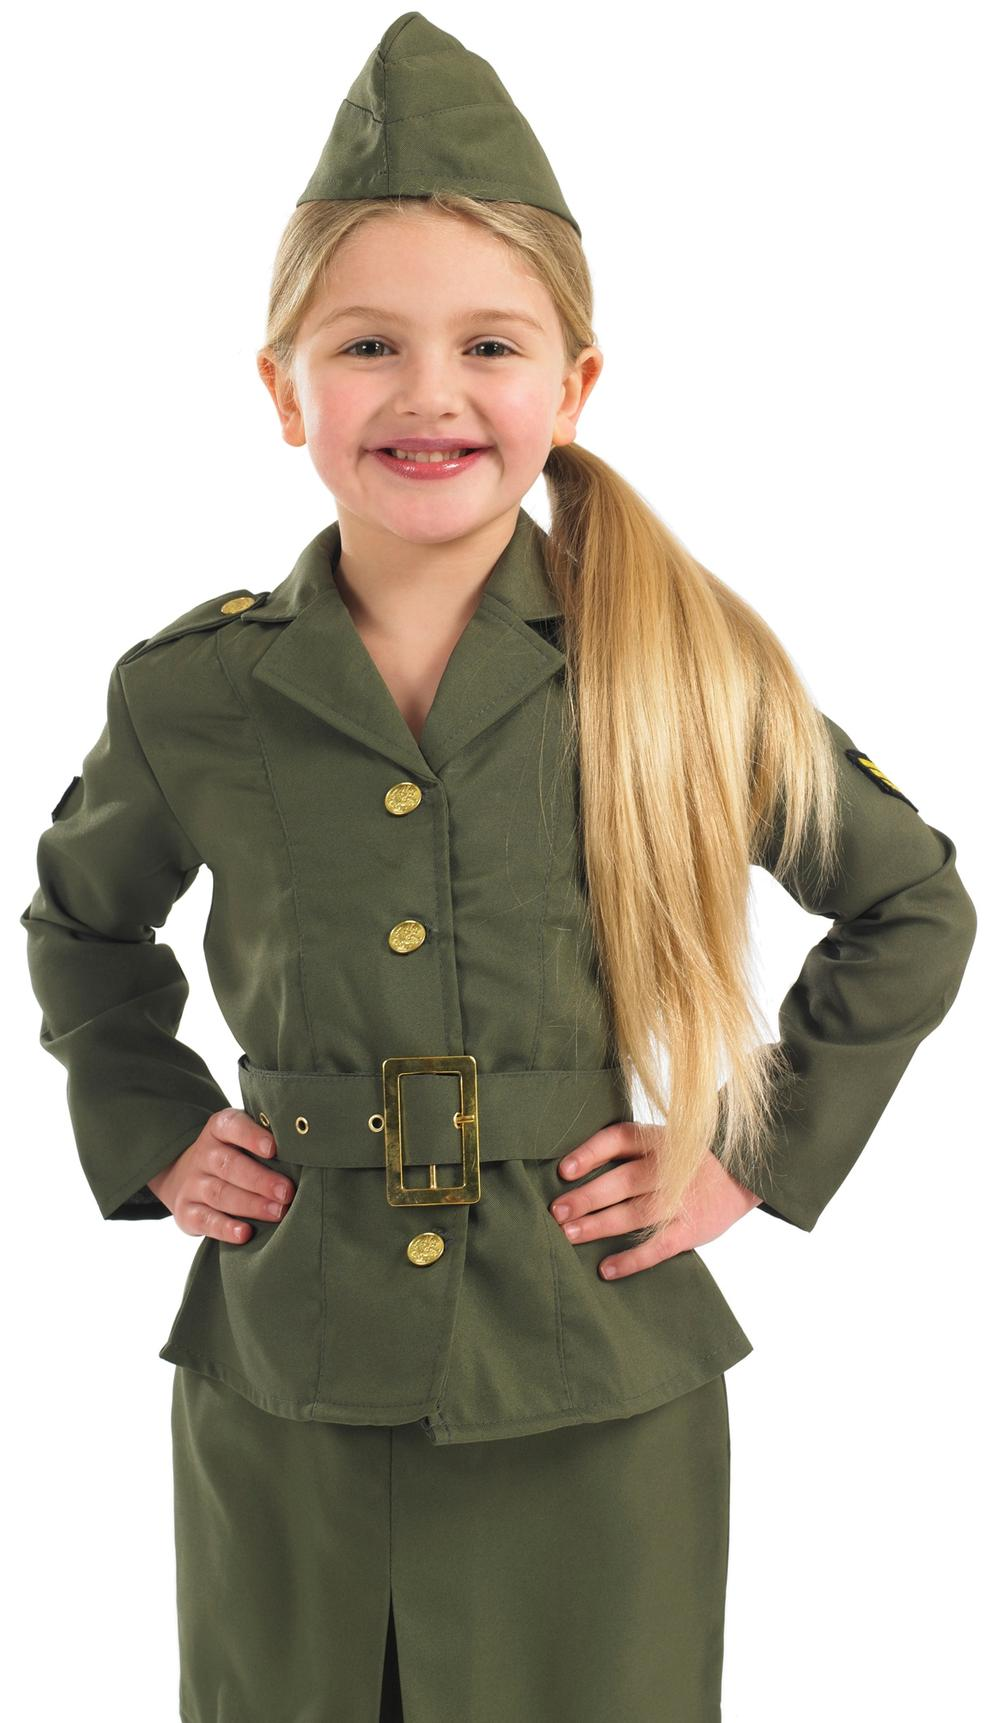 Girls Army Girl 1940s Kids Fancy Dress 30s Military Uniform Childrens Costume